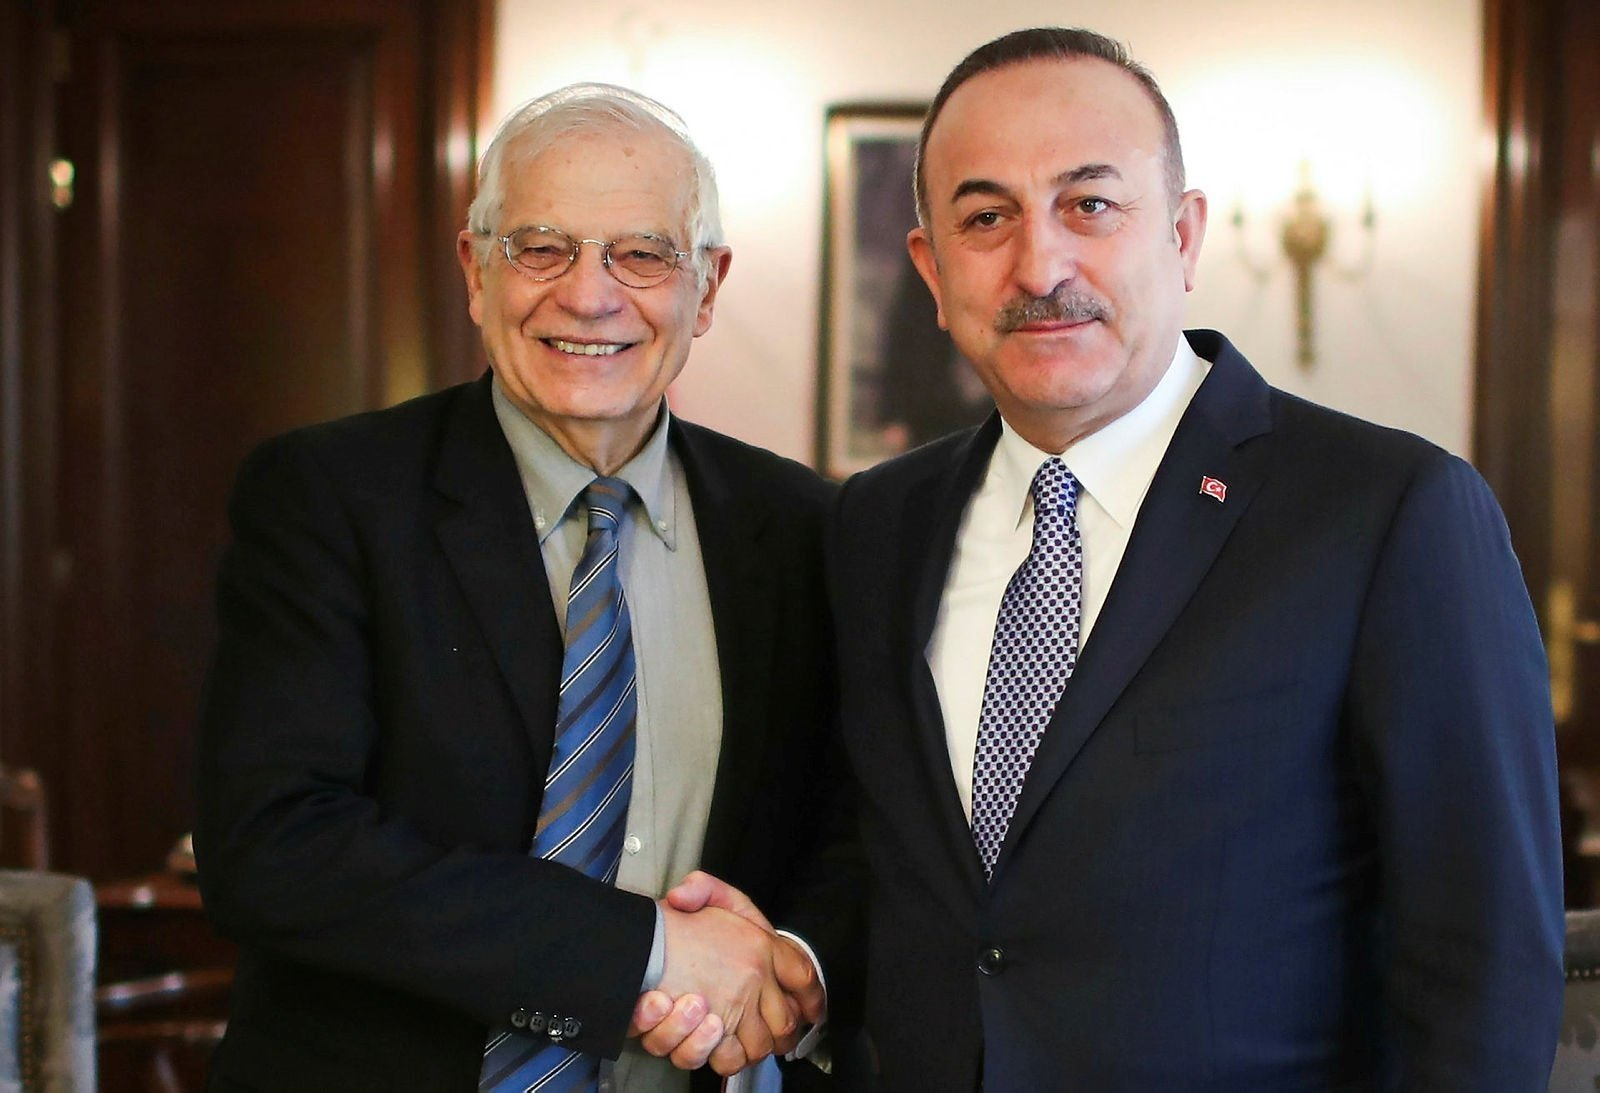 European Union Minister for Foreign Affairs Josep Borrell (L) and Turkey's Foreign Minister Mevlüt Çavuşoğlu shake hands in an undated photo. (AA Photo)